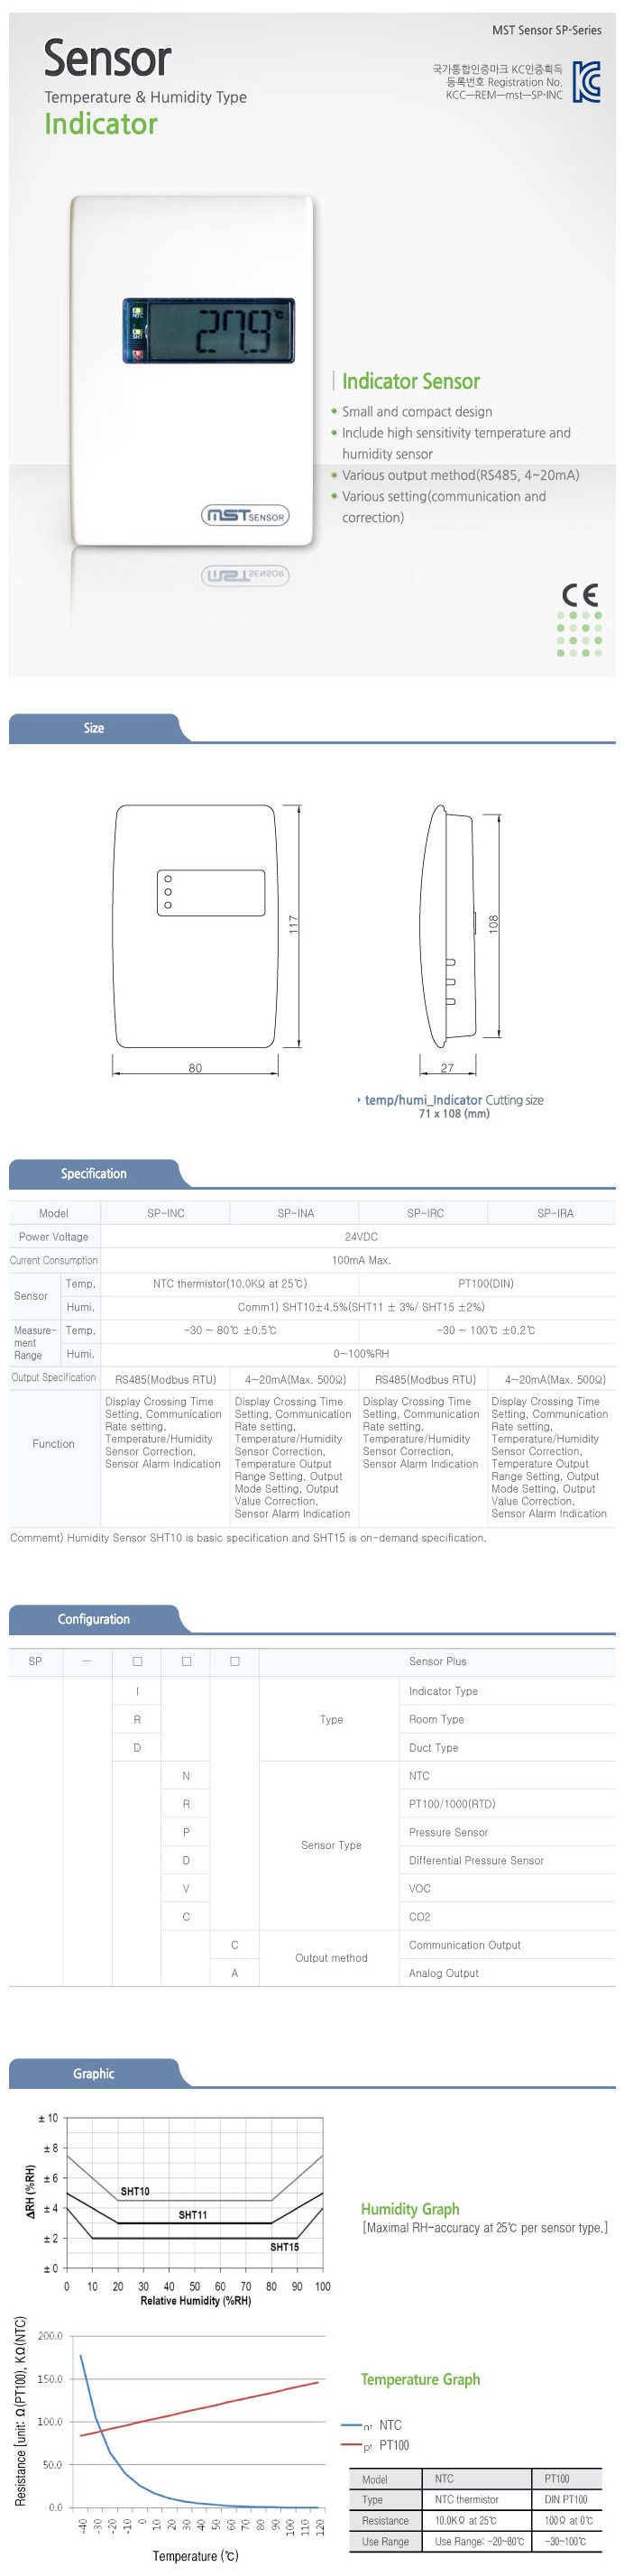 MST Temperature / Humidity Sensor (Indicator) SP Series